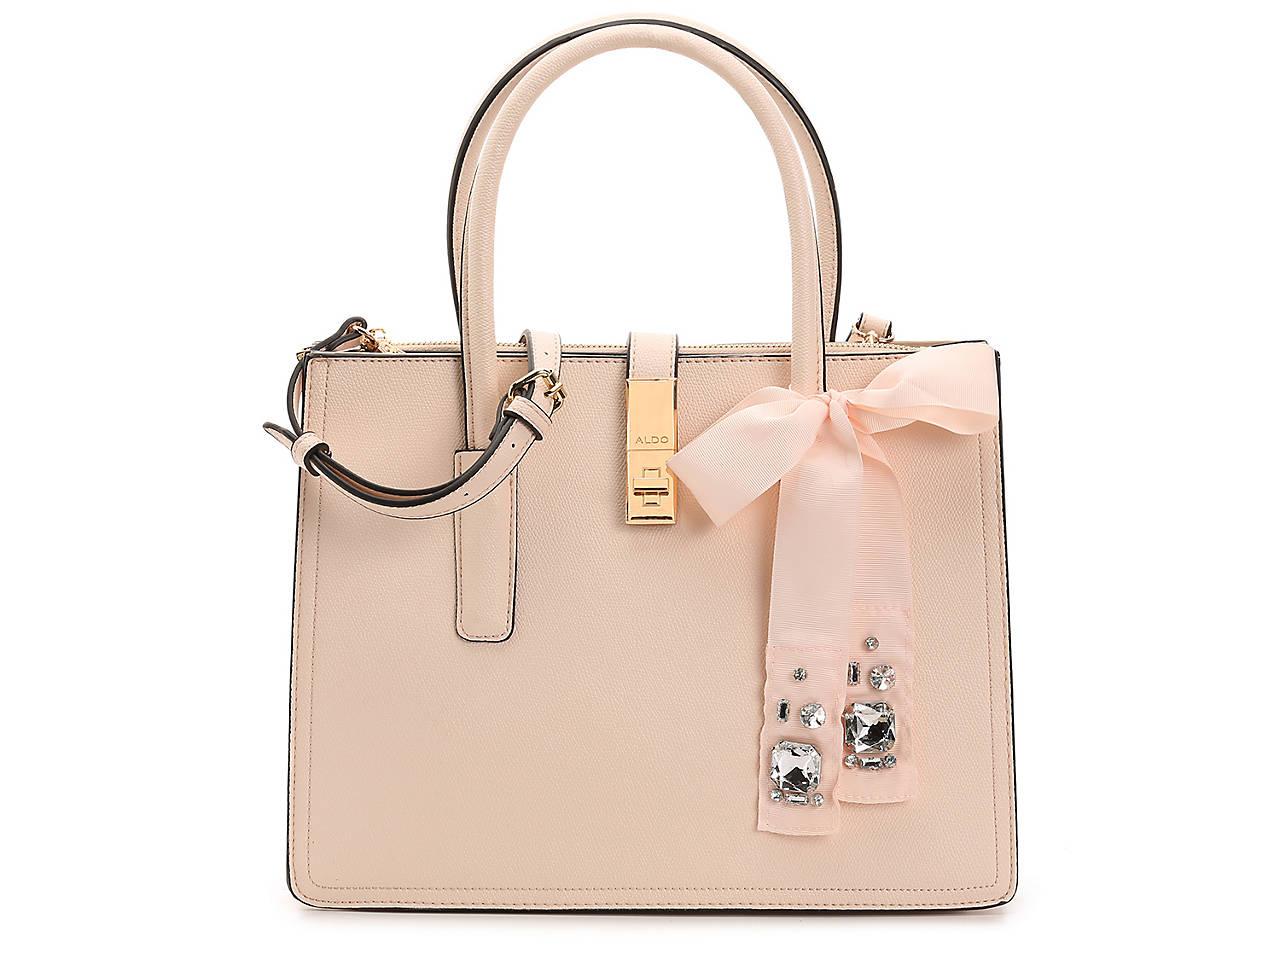 8411e1ac2 Aldo Gararoge Large Satchel Women's Handbags & Accessories | DSW